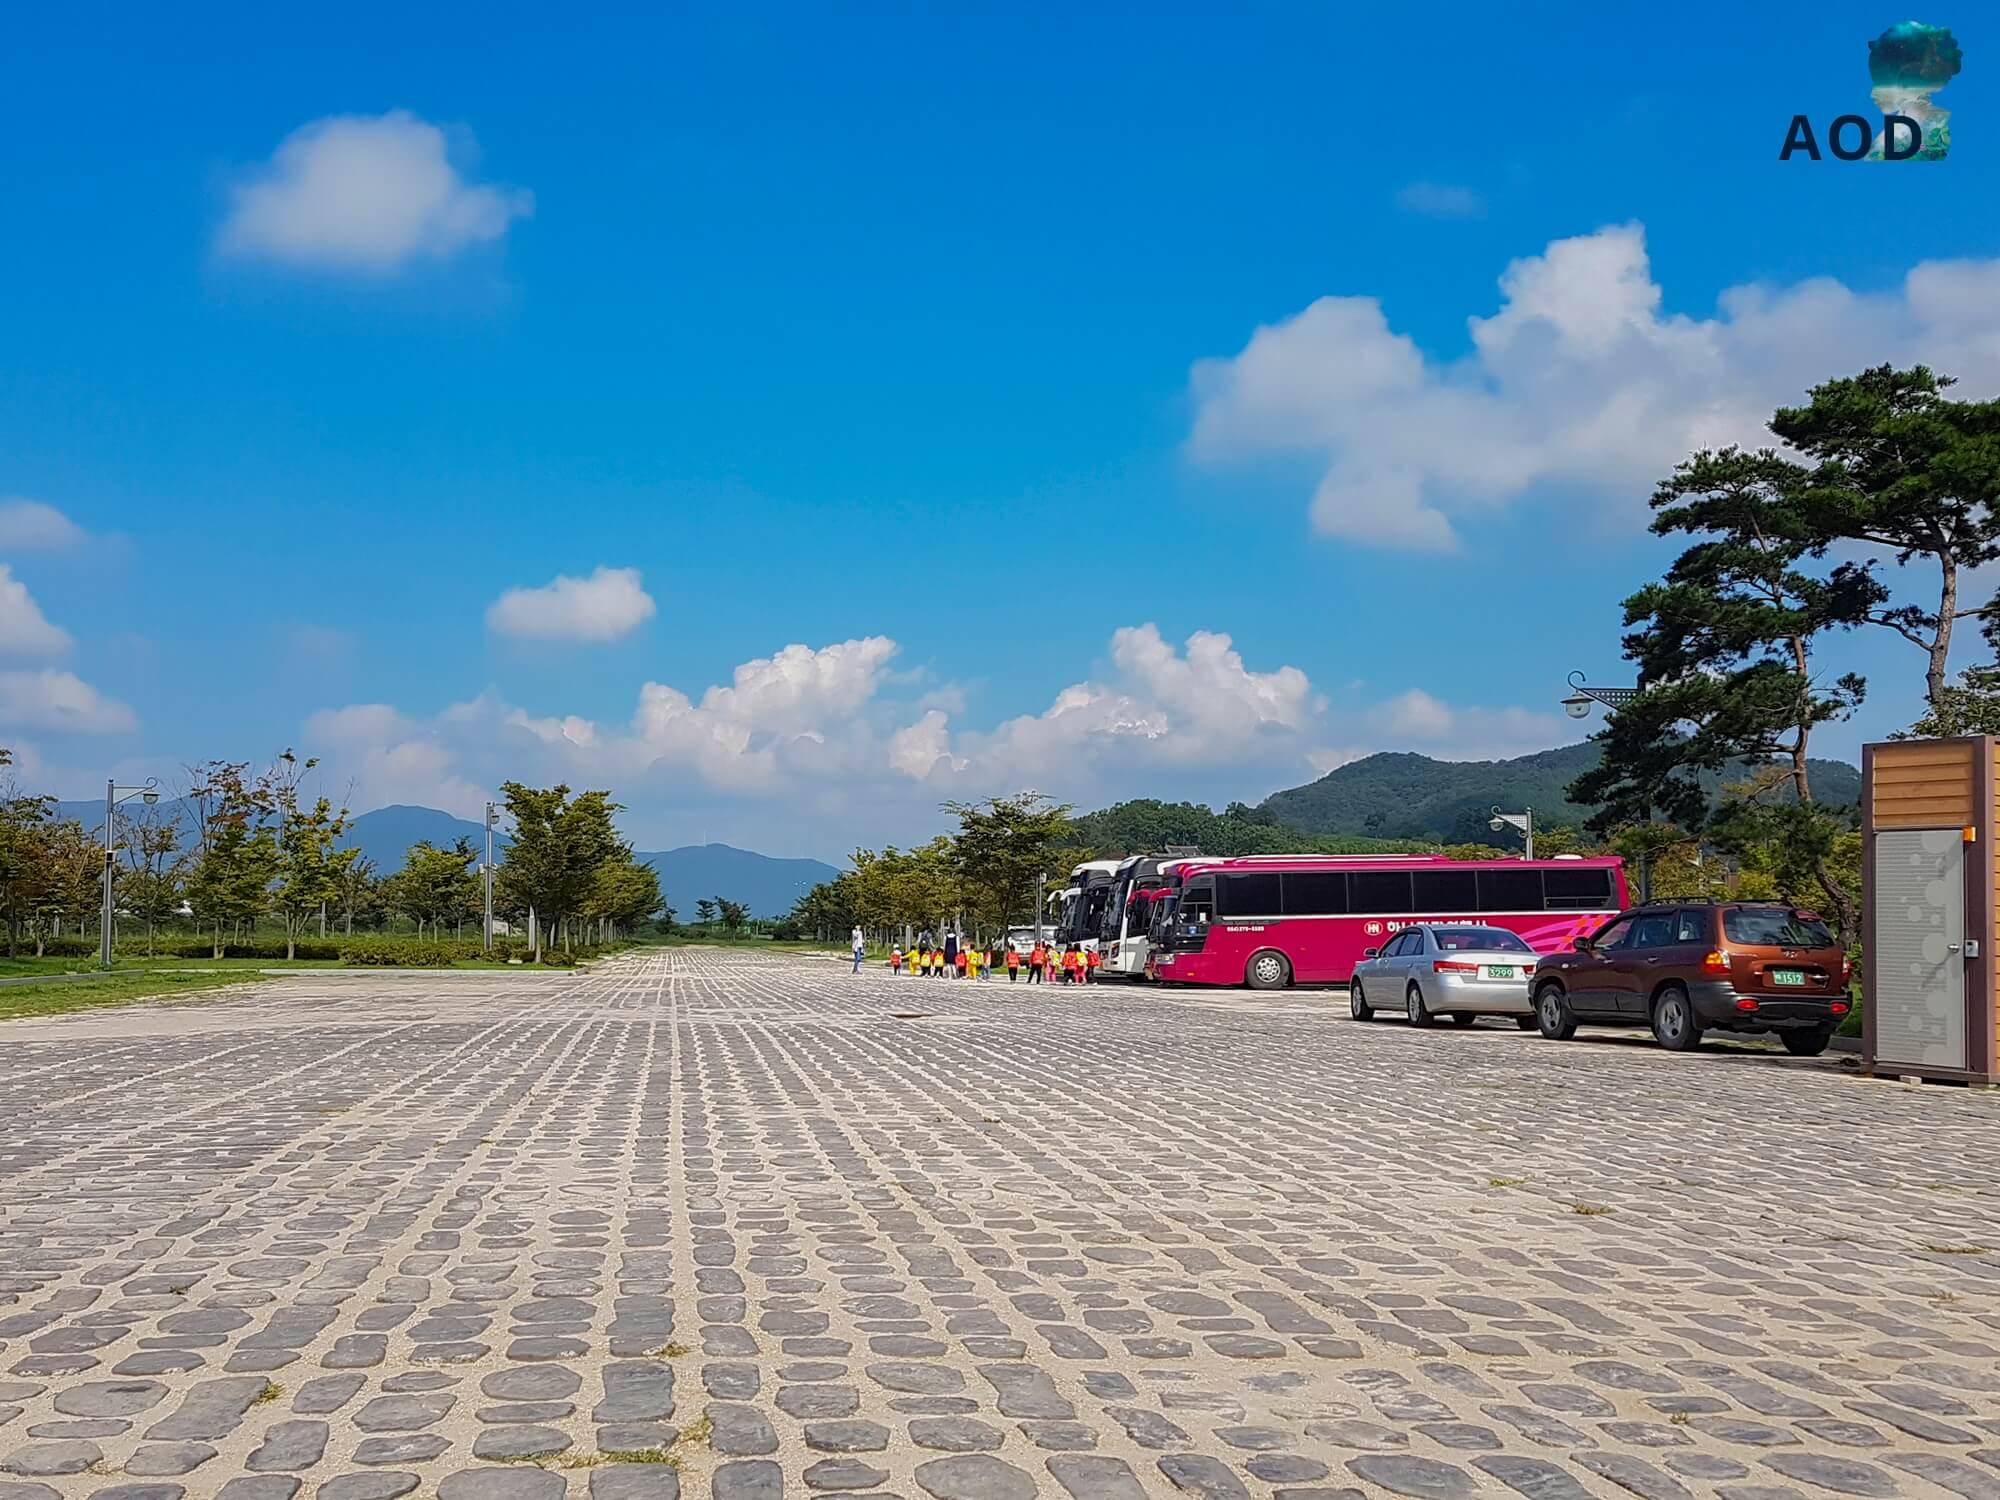 Großer Parkplatz vor dem Yangdong Maeul